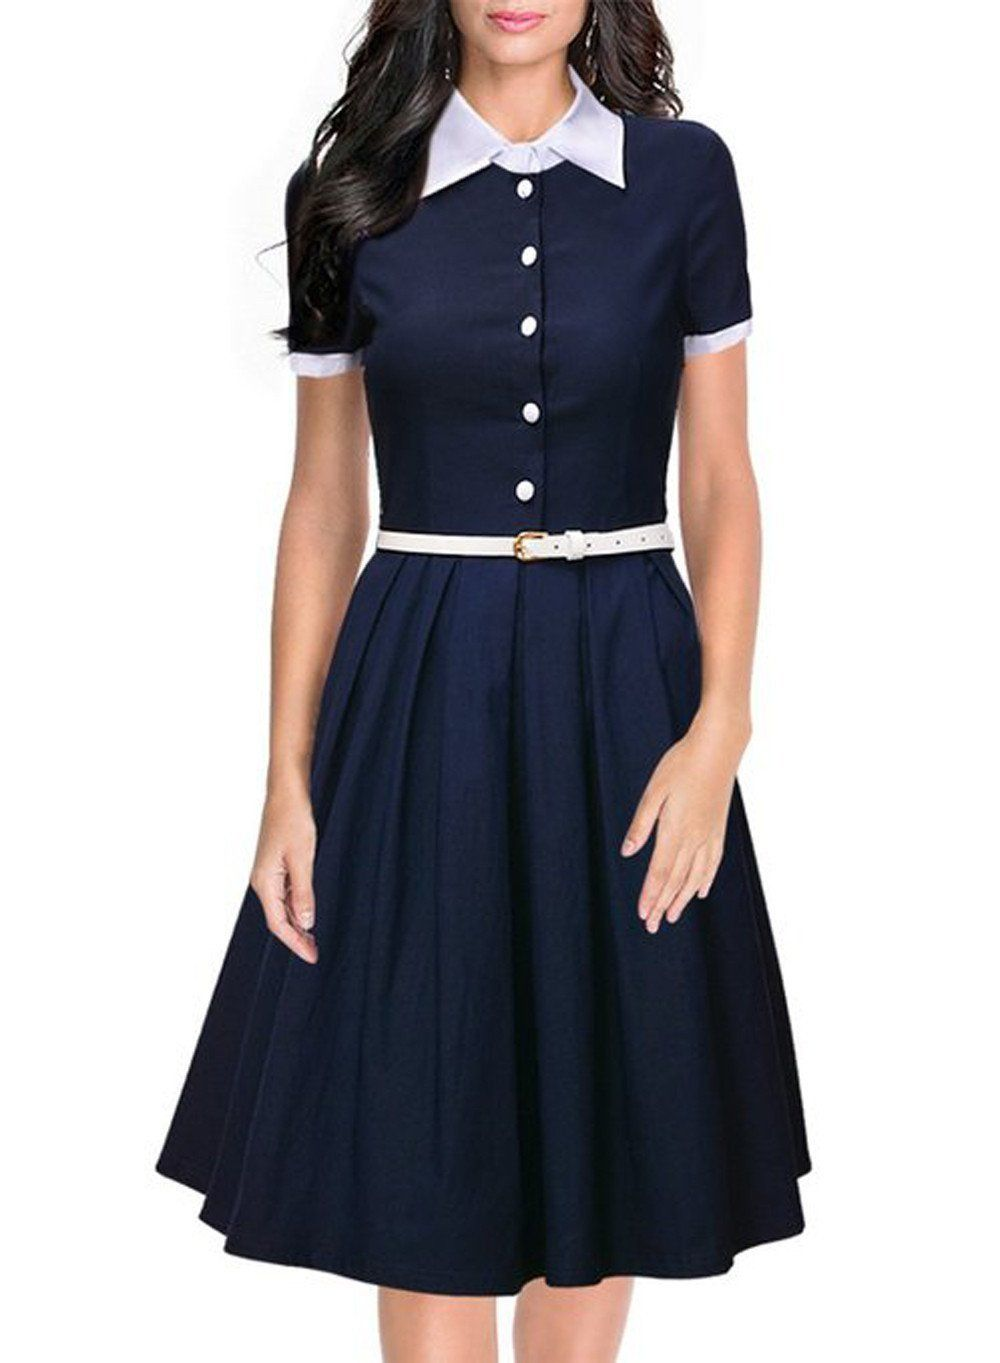 75f445e13a1 Clothing Type  Women Dresses